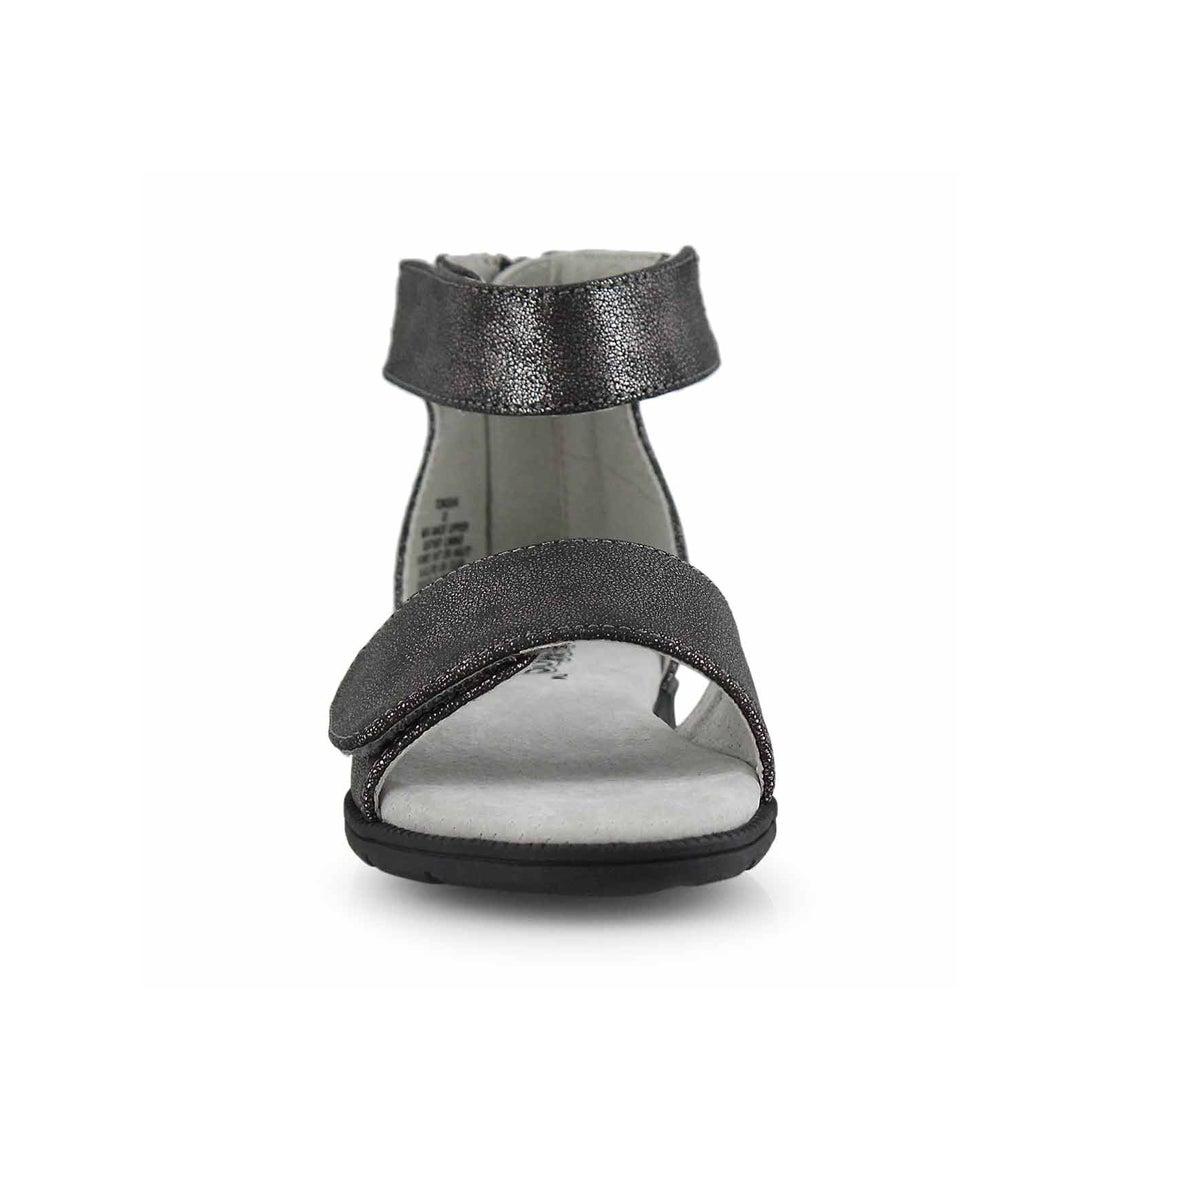 Grls Tonisha titanio casual sandal